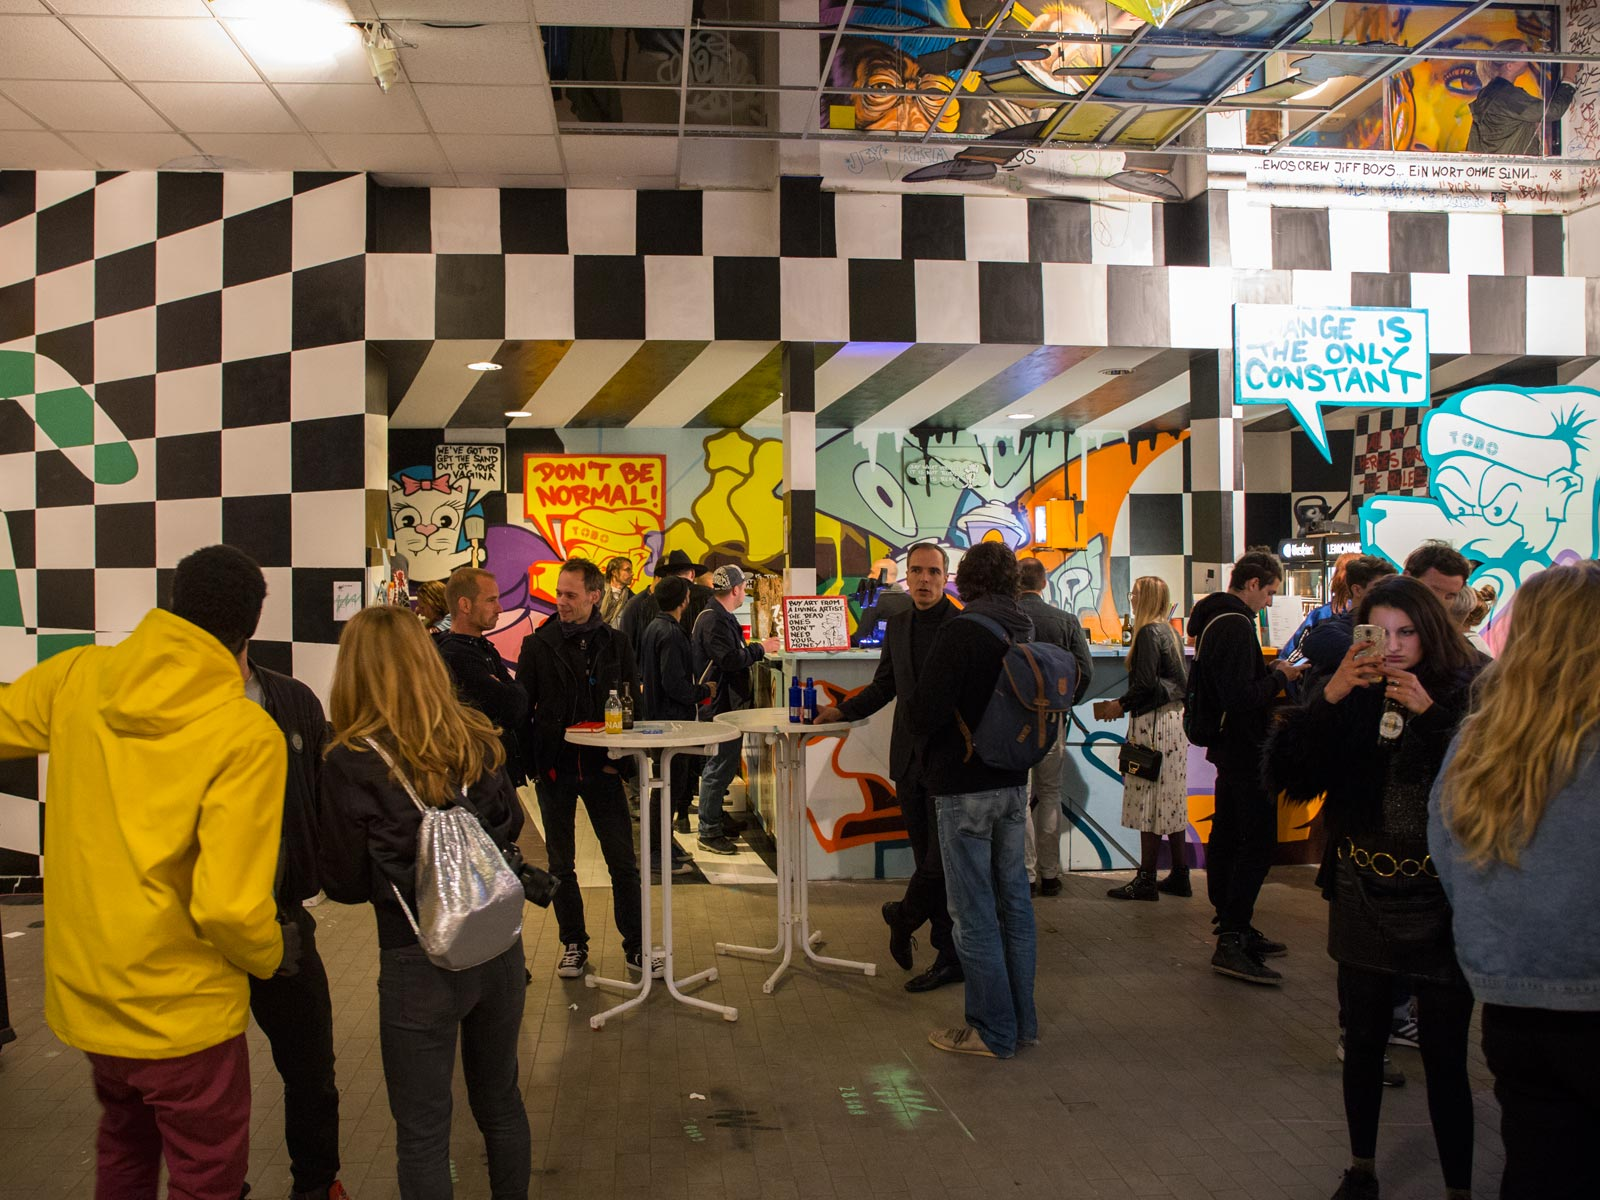 Raumgestaltung wandelism Bar Aerosolikz Tobo Party